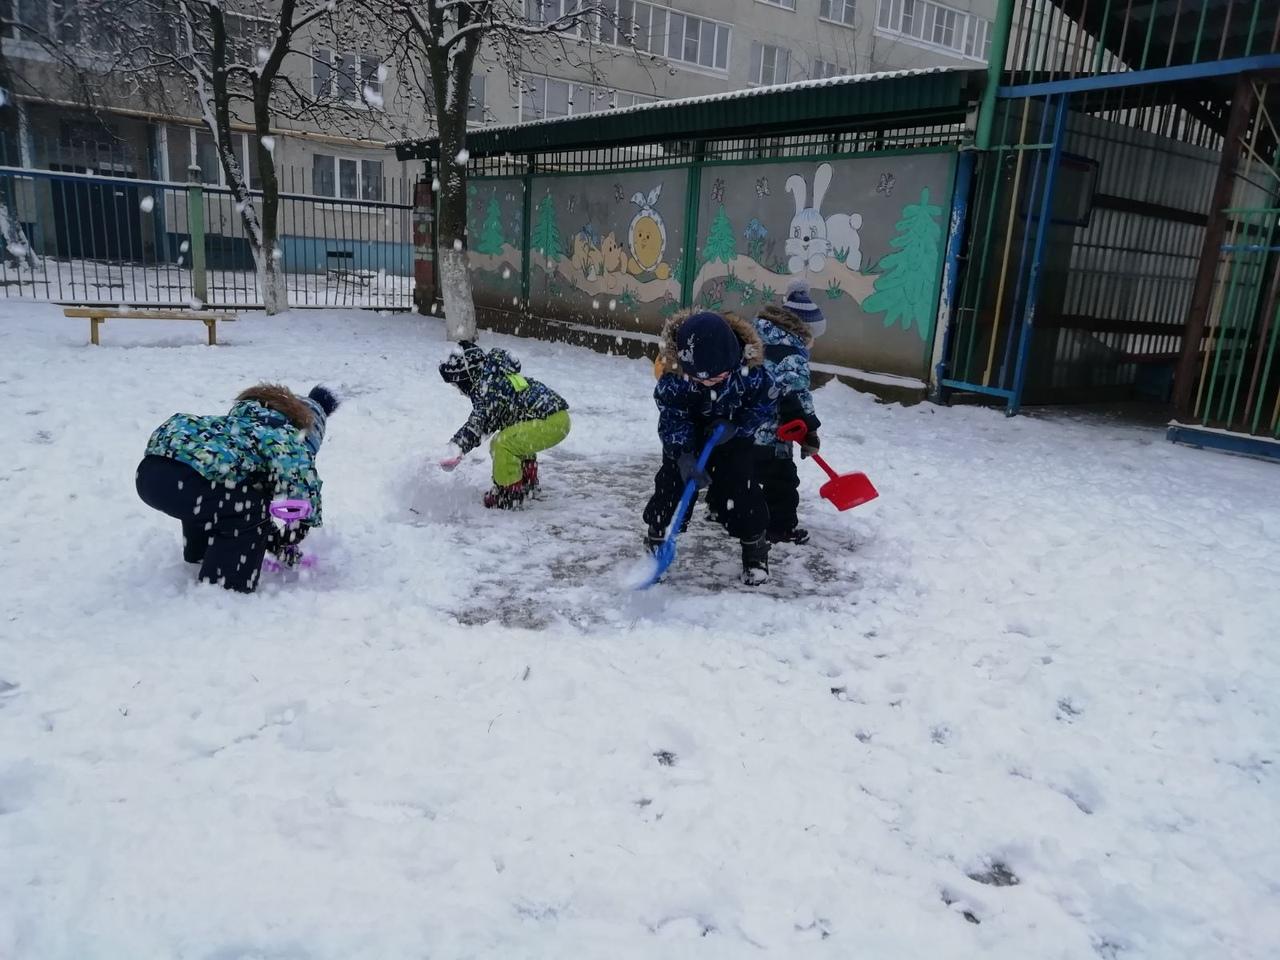 Снего-снего снегопад! Хватит дела для лопат!